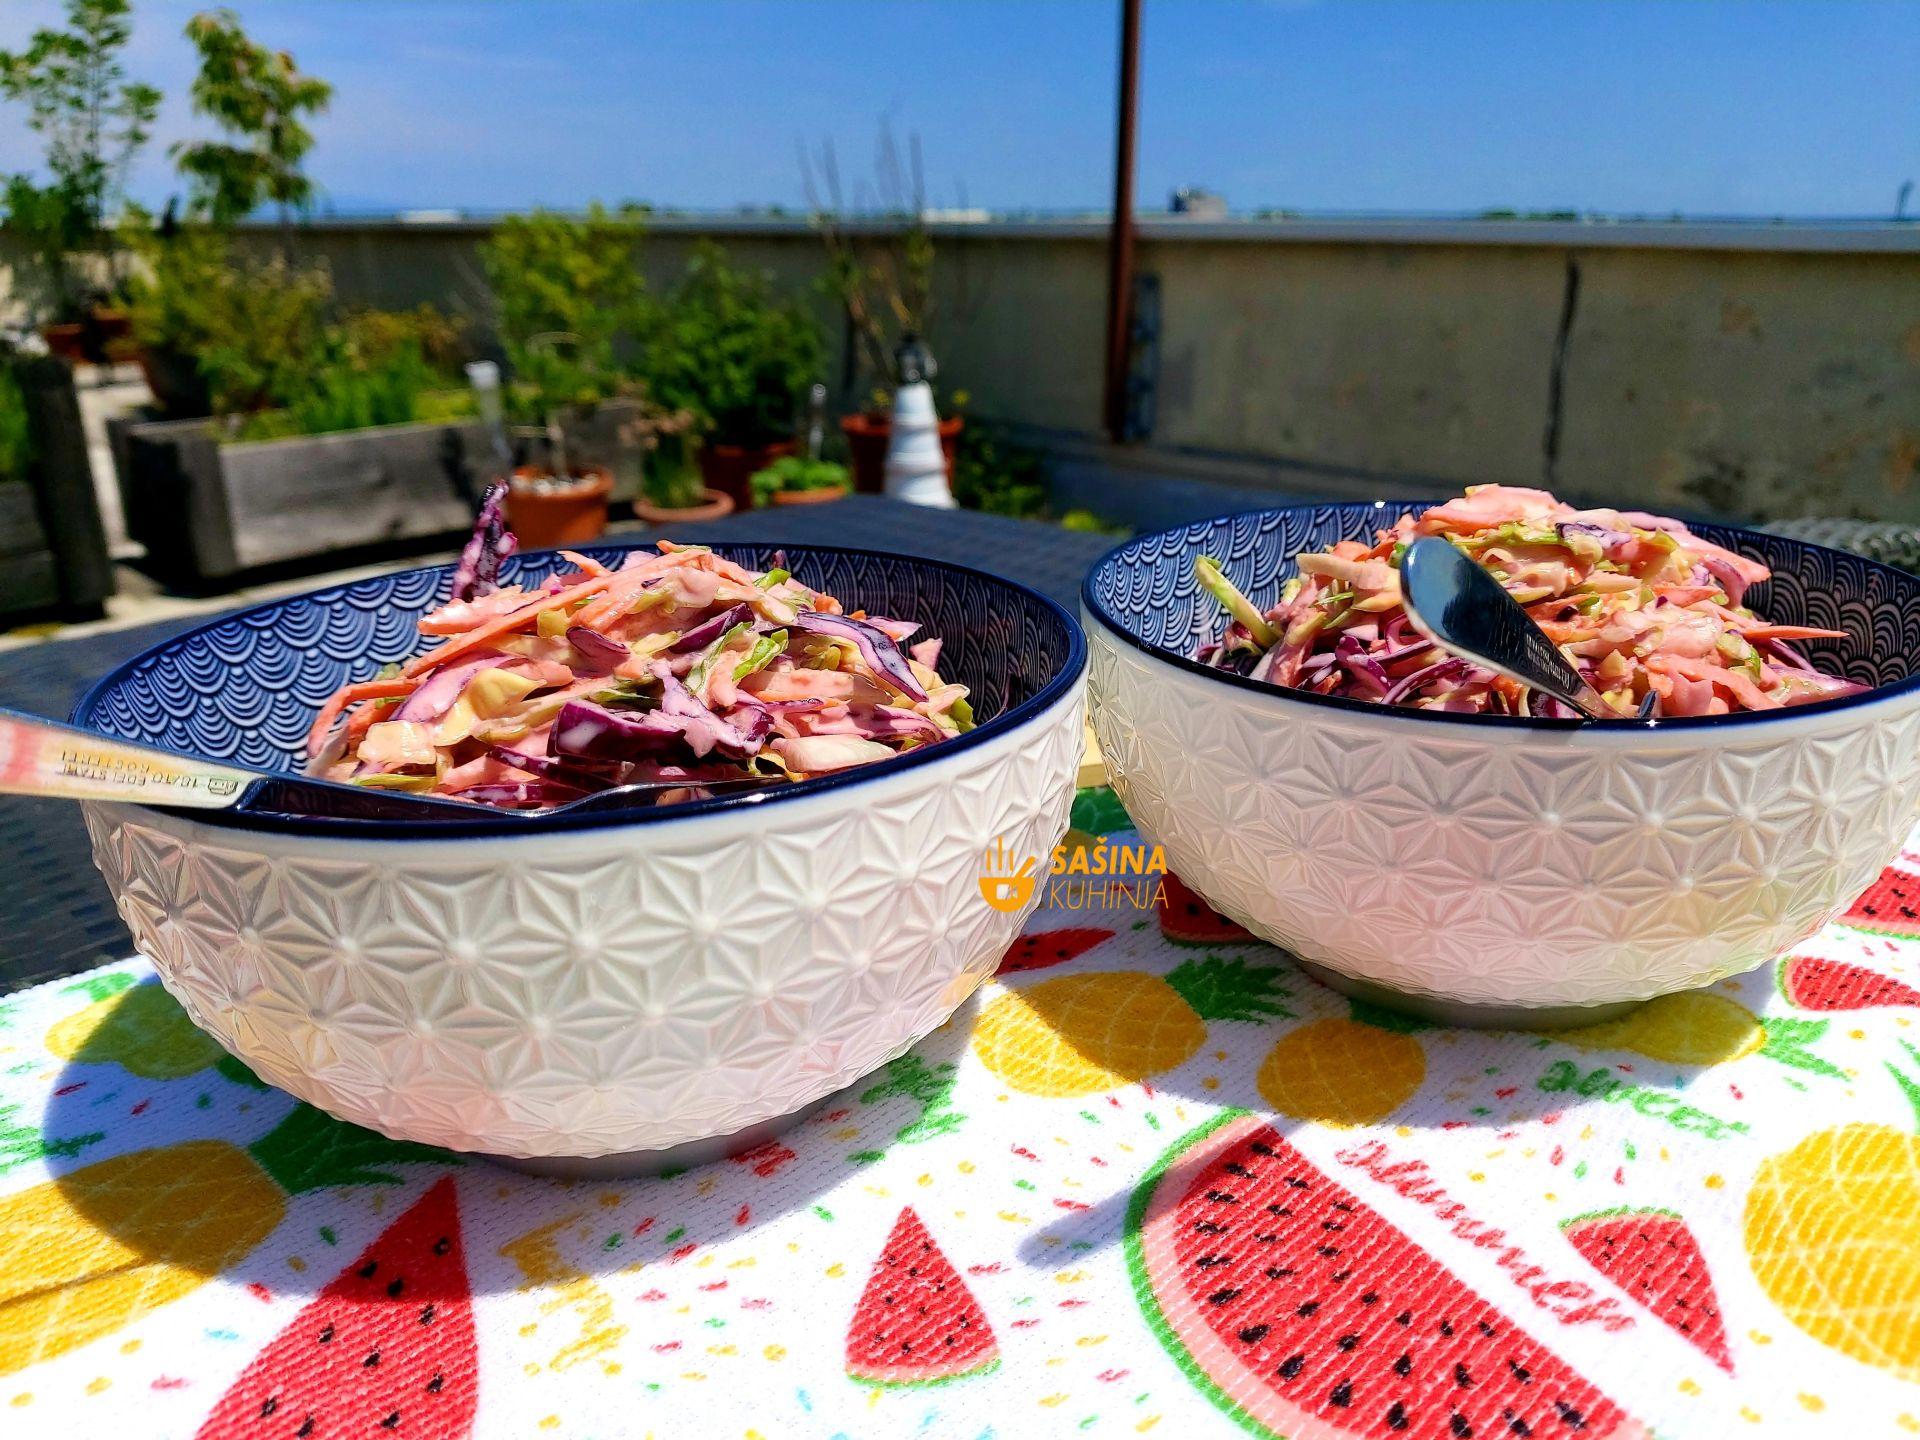 coleslaw_salata_recept_salad_recipe_sašina_kuhinja_recepti